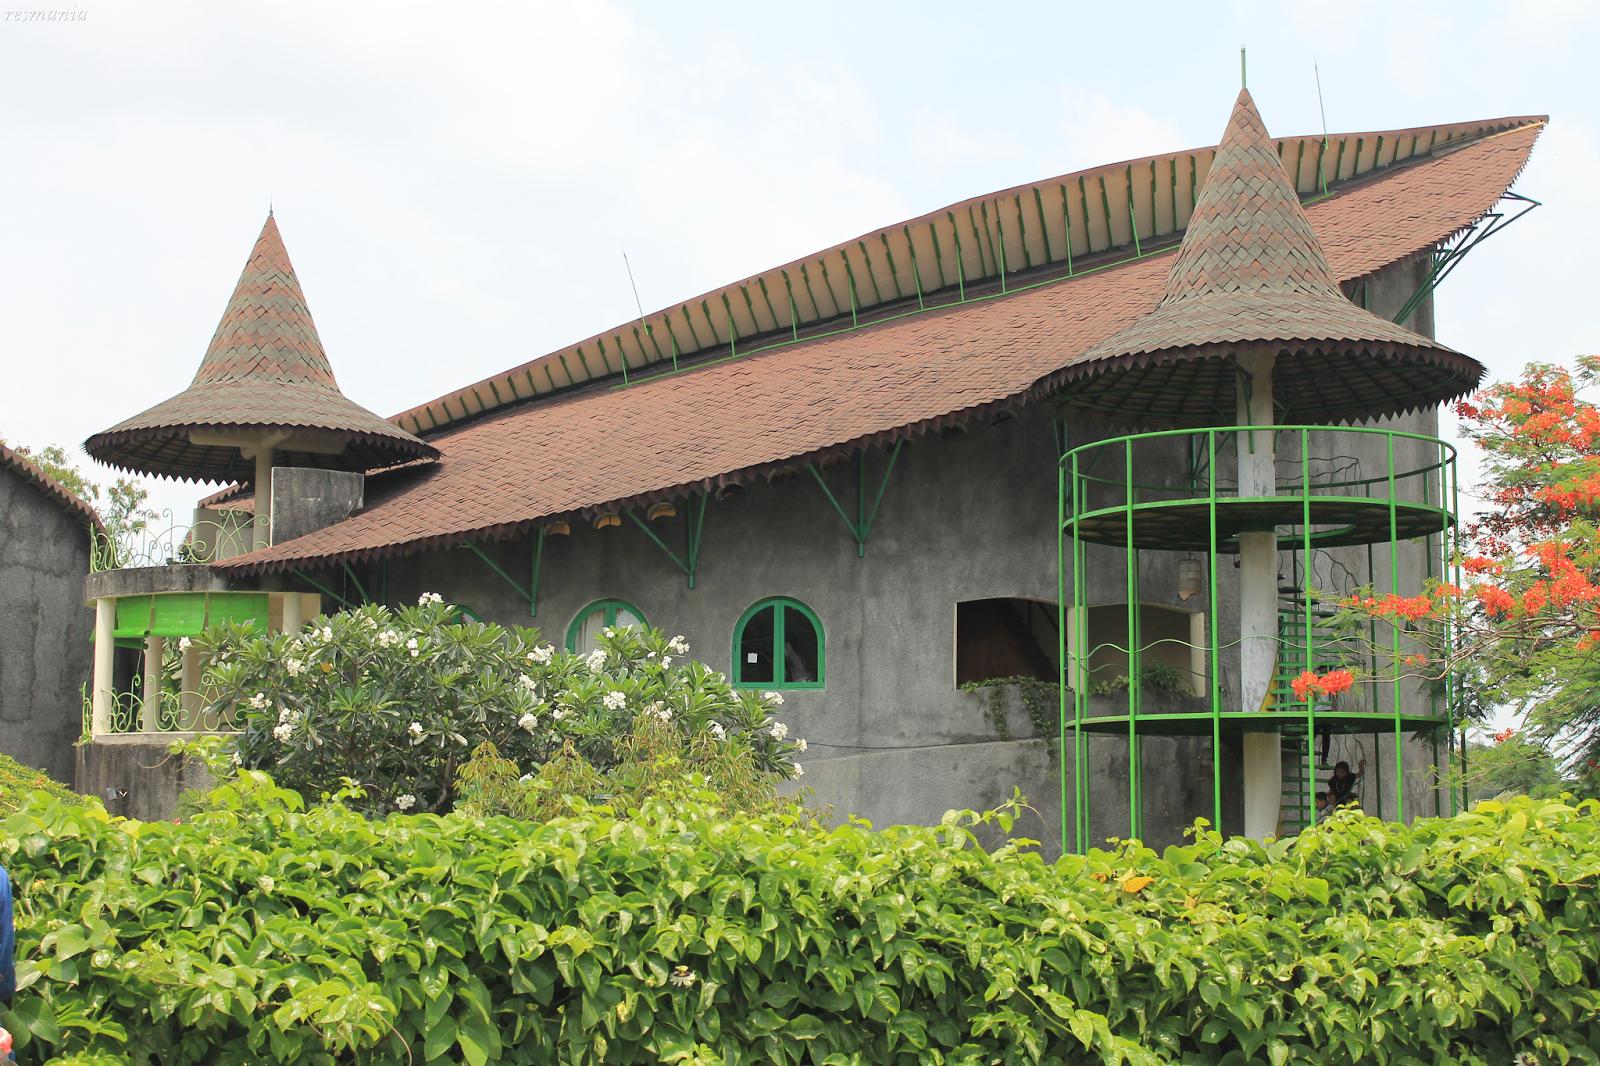 Resmania Gallery Affandi Museum Terletak Jl Laksda Adisucipto 167 Caturtunggal